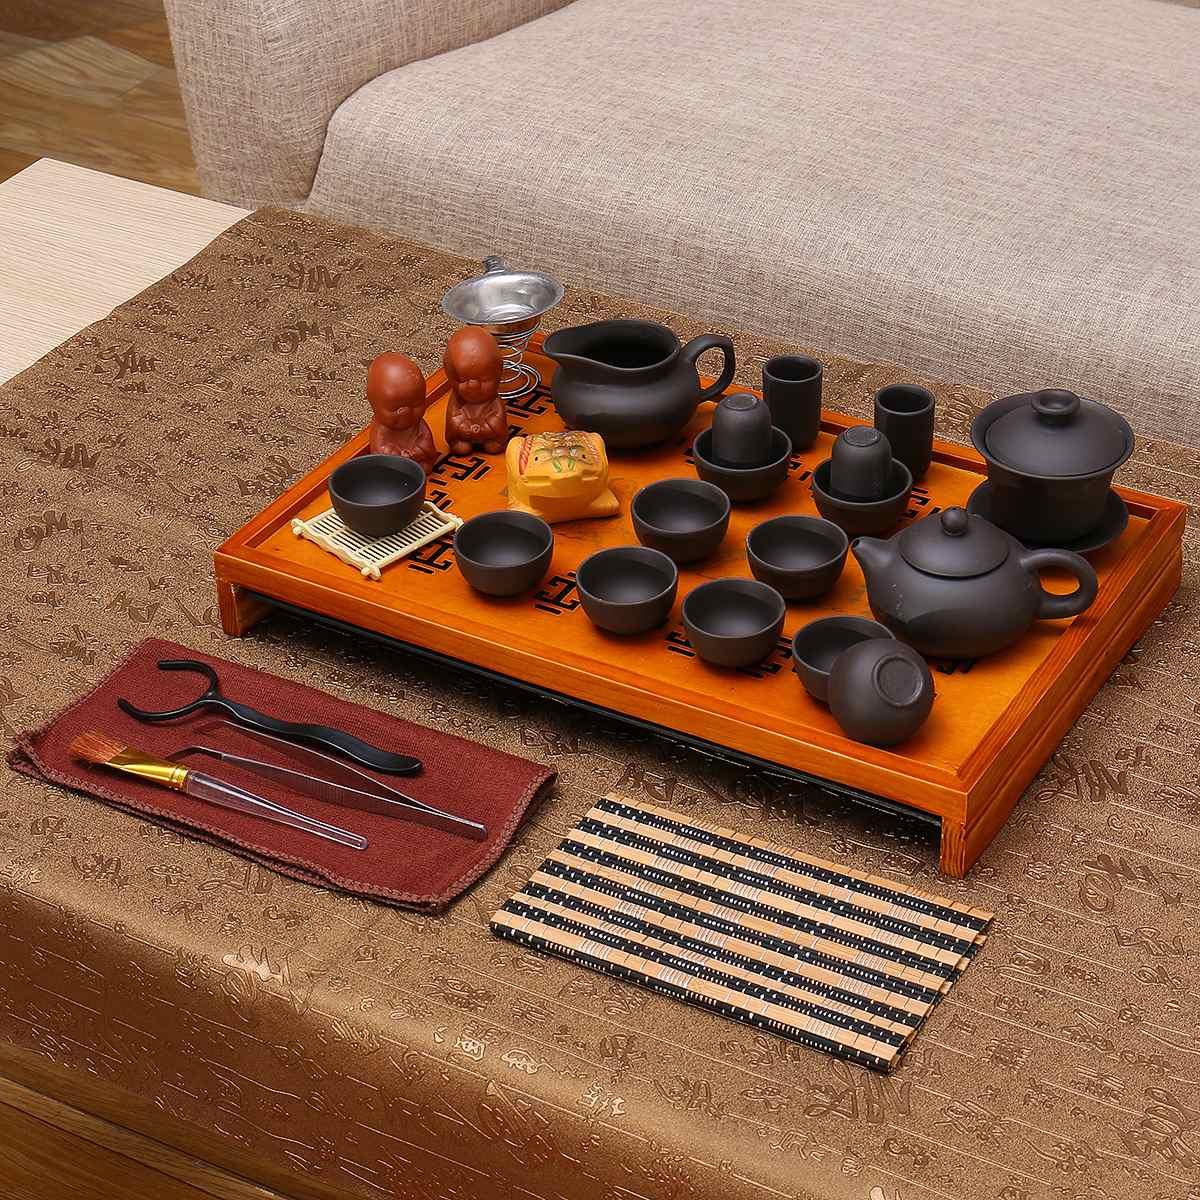 Purple Clay Kung Fu Tea Set Yixing Drinkware Tea Cup Tureen Infuser Chinese Tea Ceremony with Wood Tea Tray Home Teaware Sets